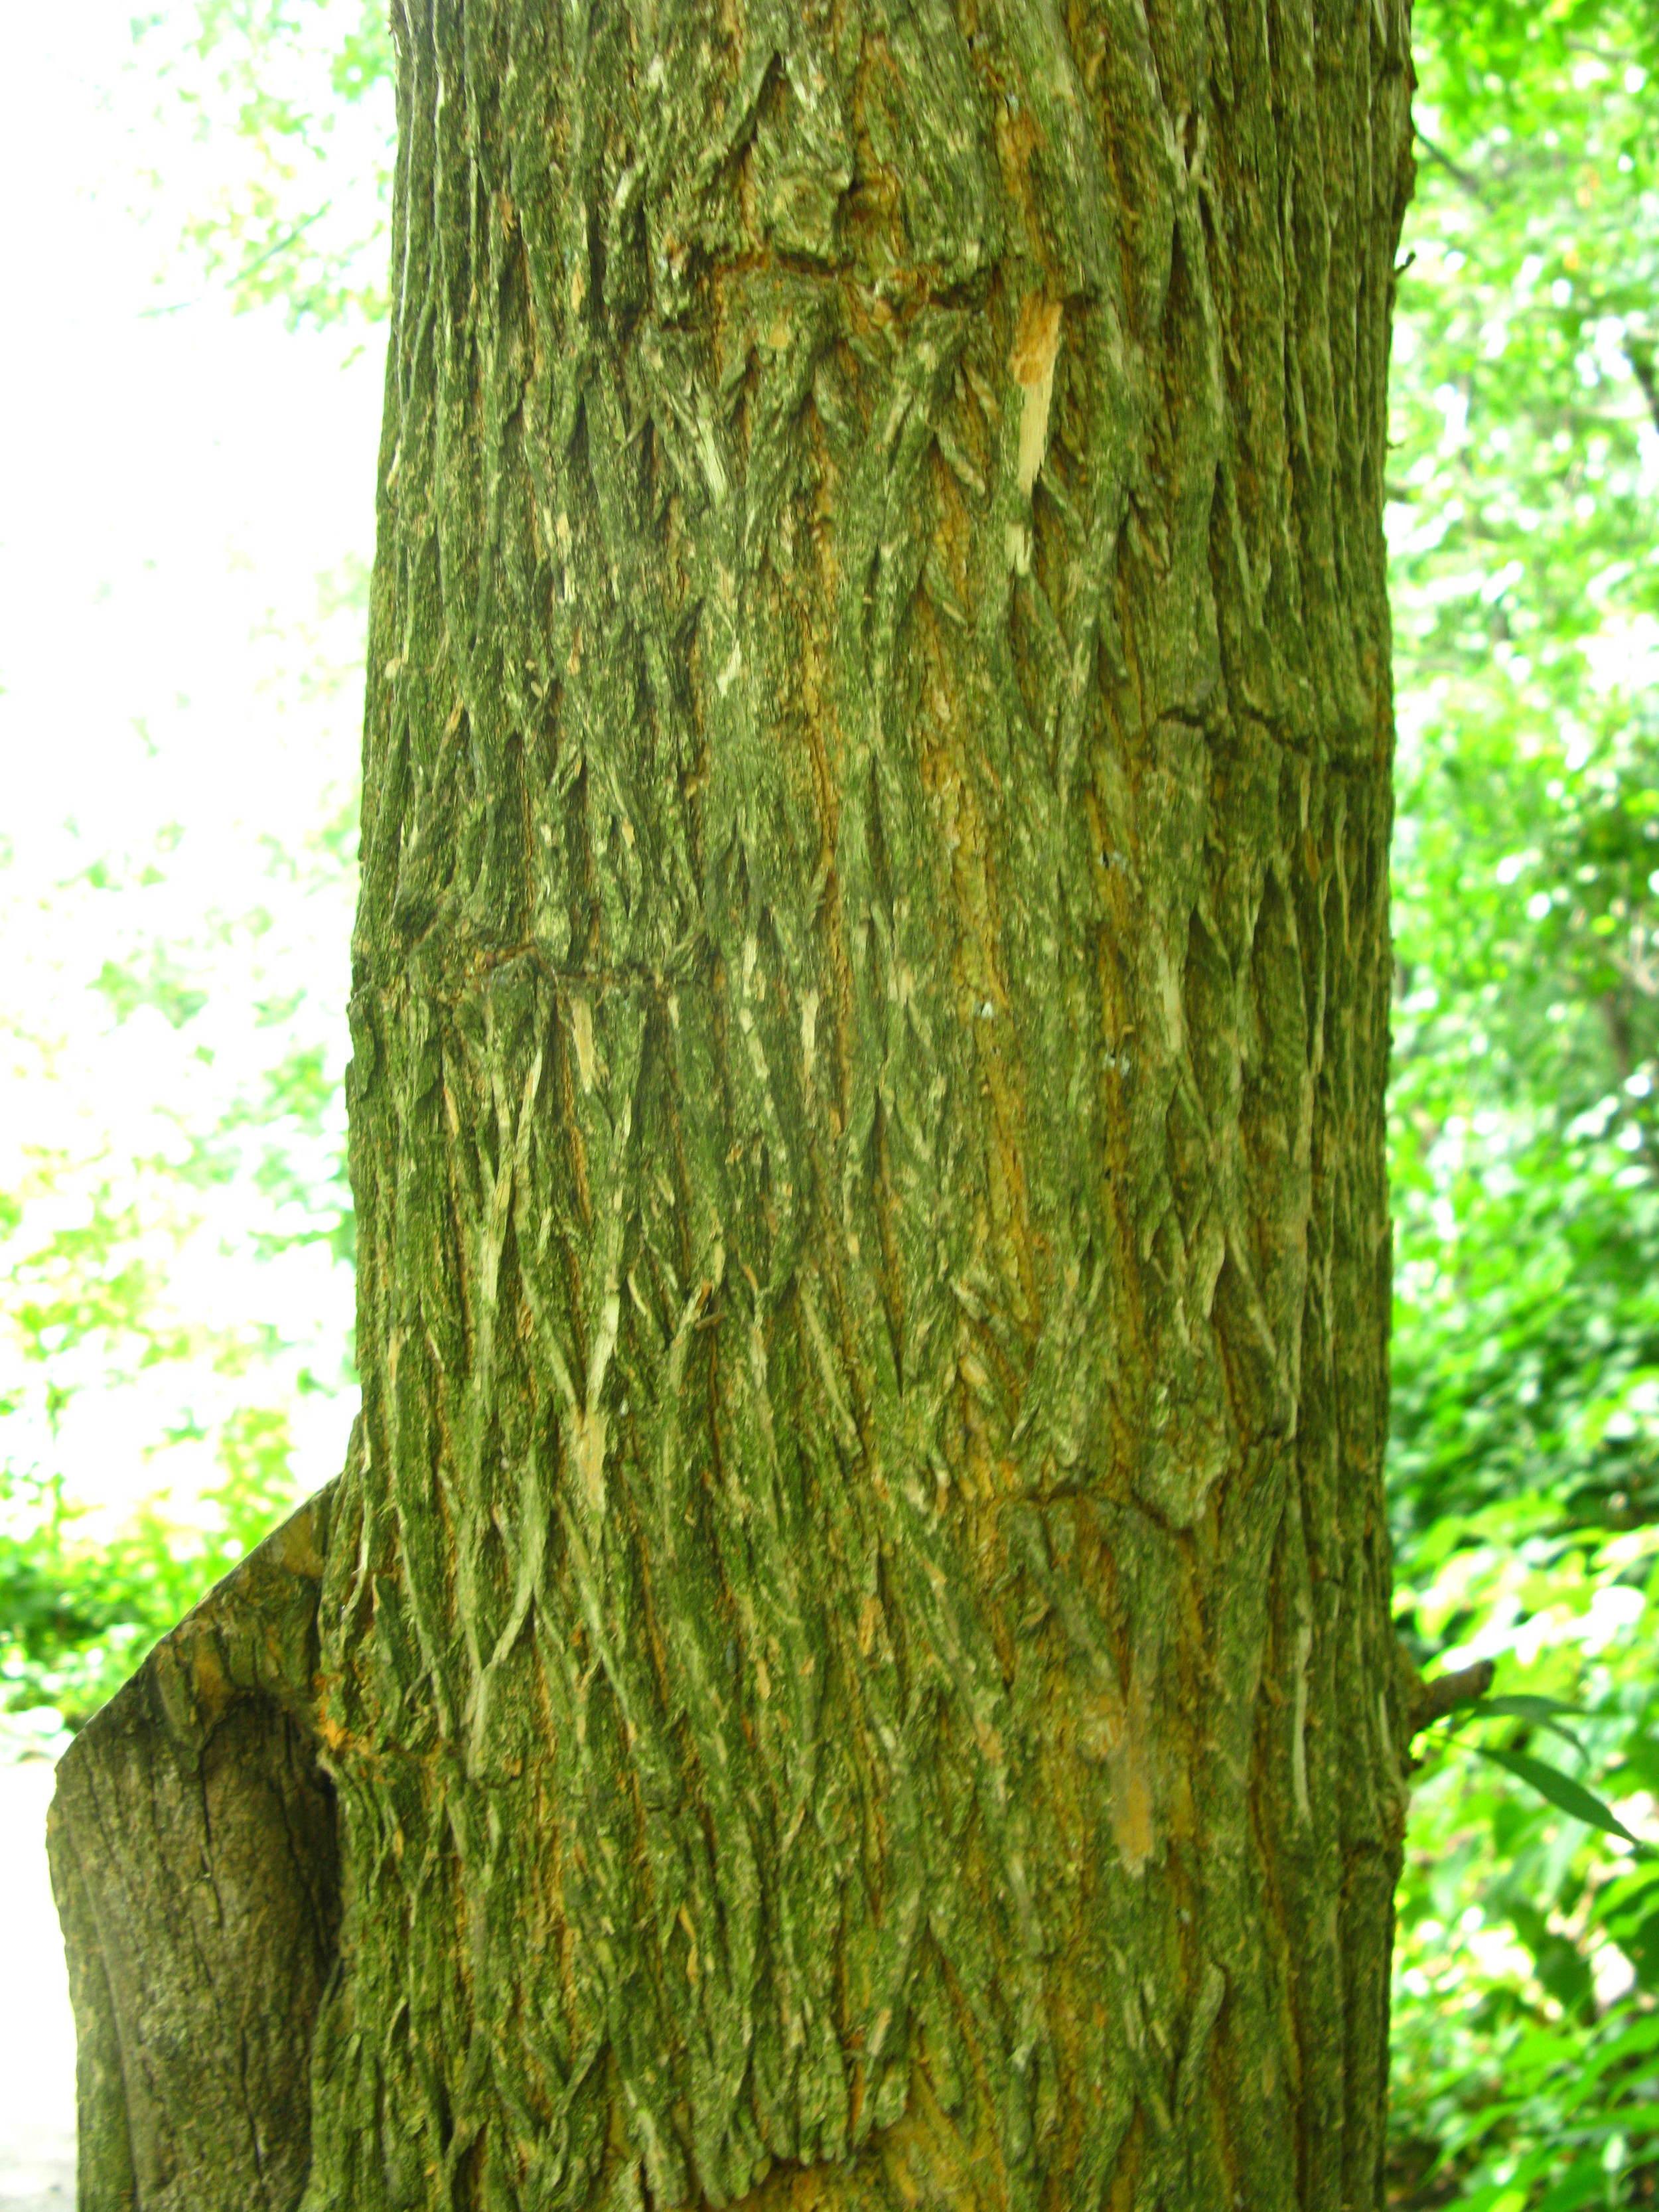 Maclura pomifera Moraceae